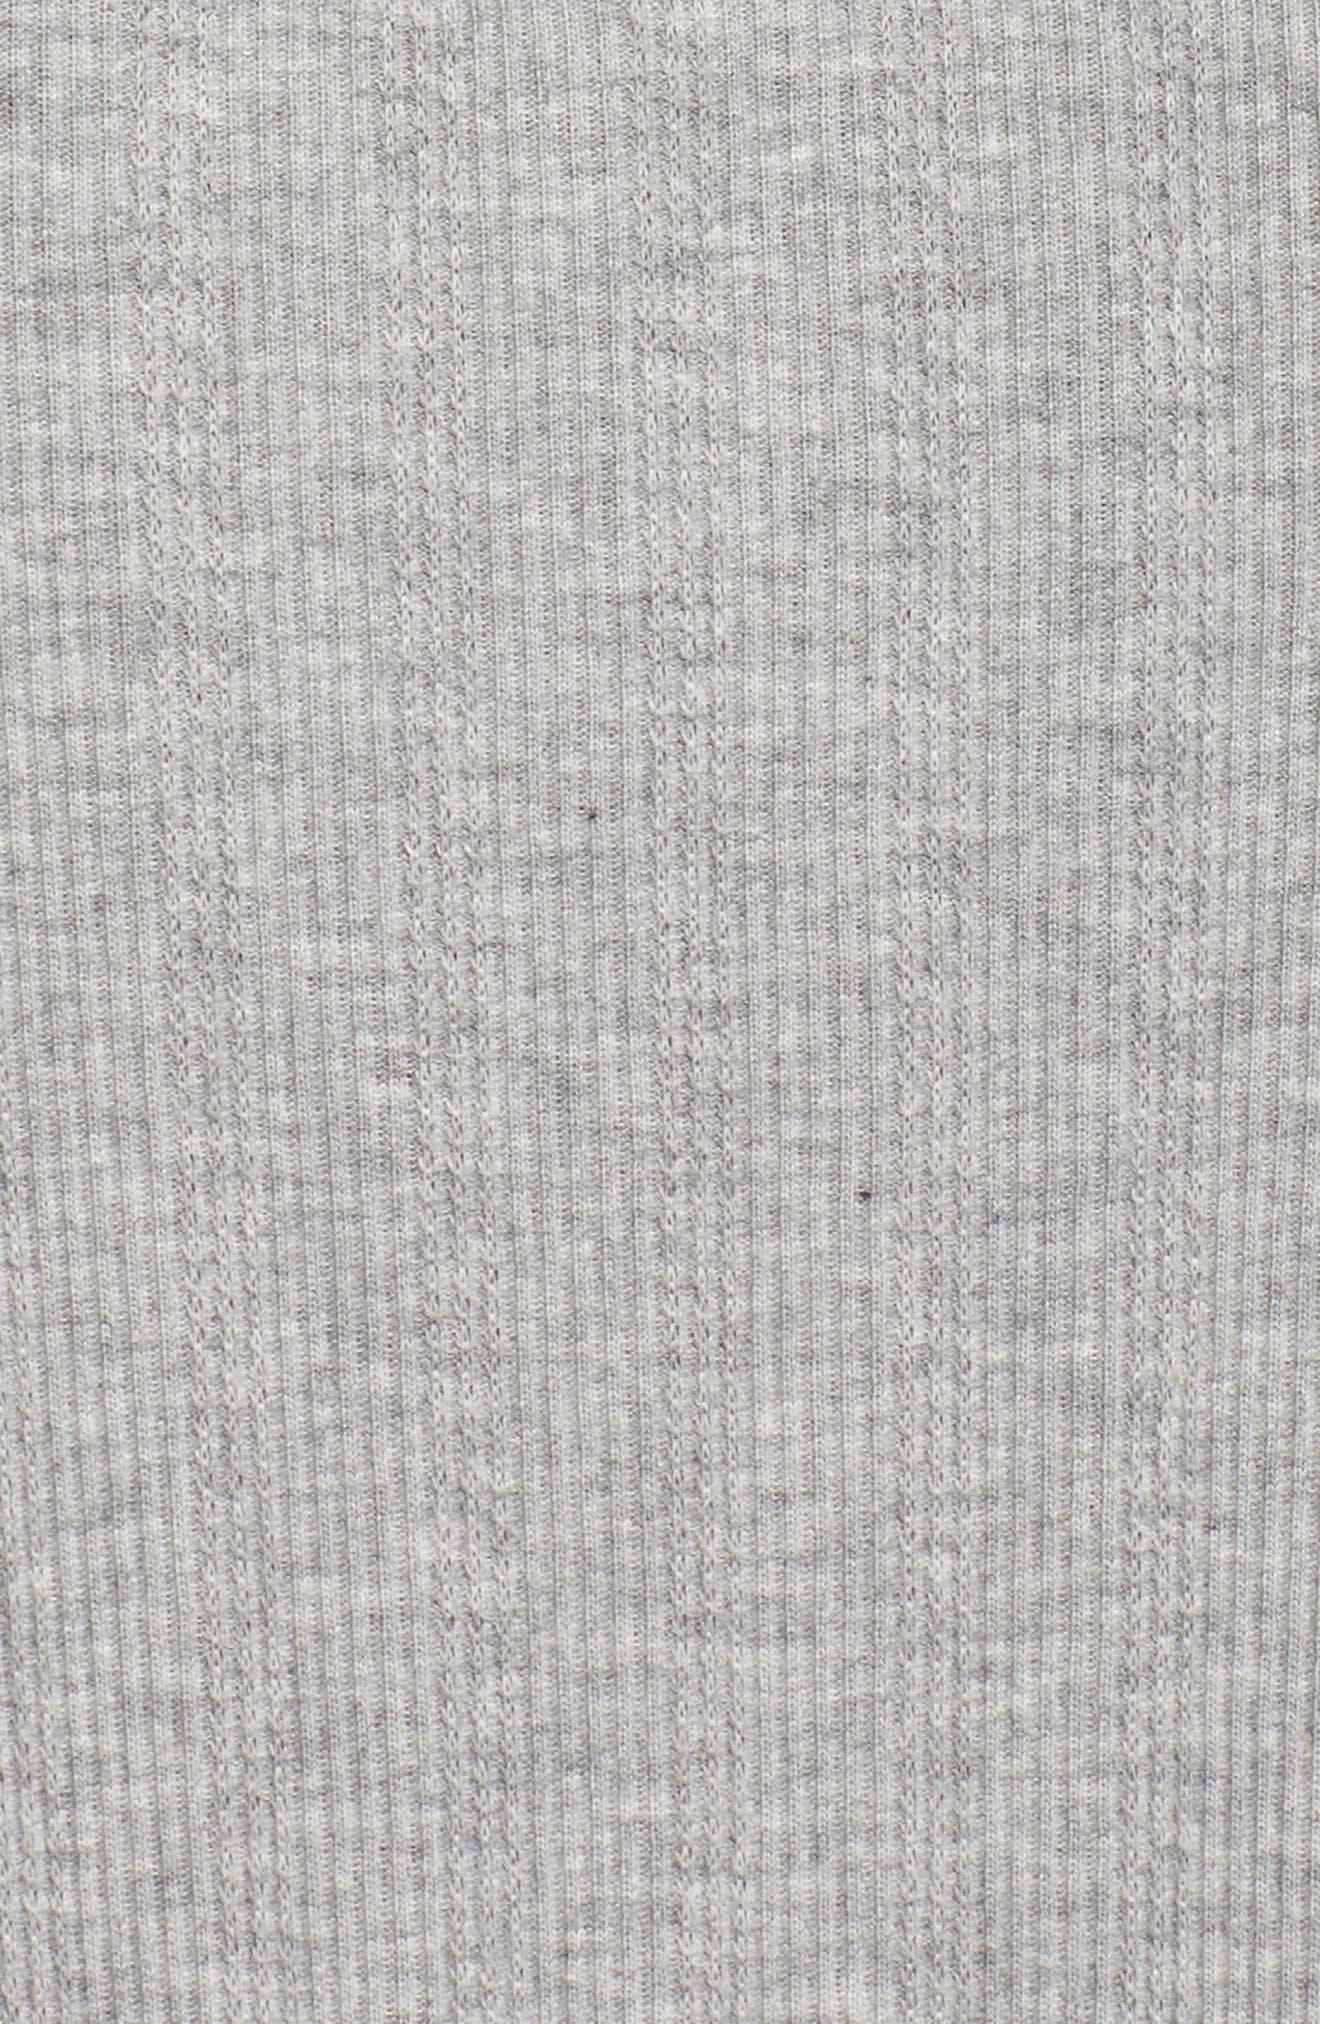 Lace Neck Sleep Shirt,                             Alternate thumbnail 5, color,                             022